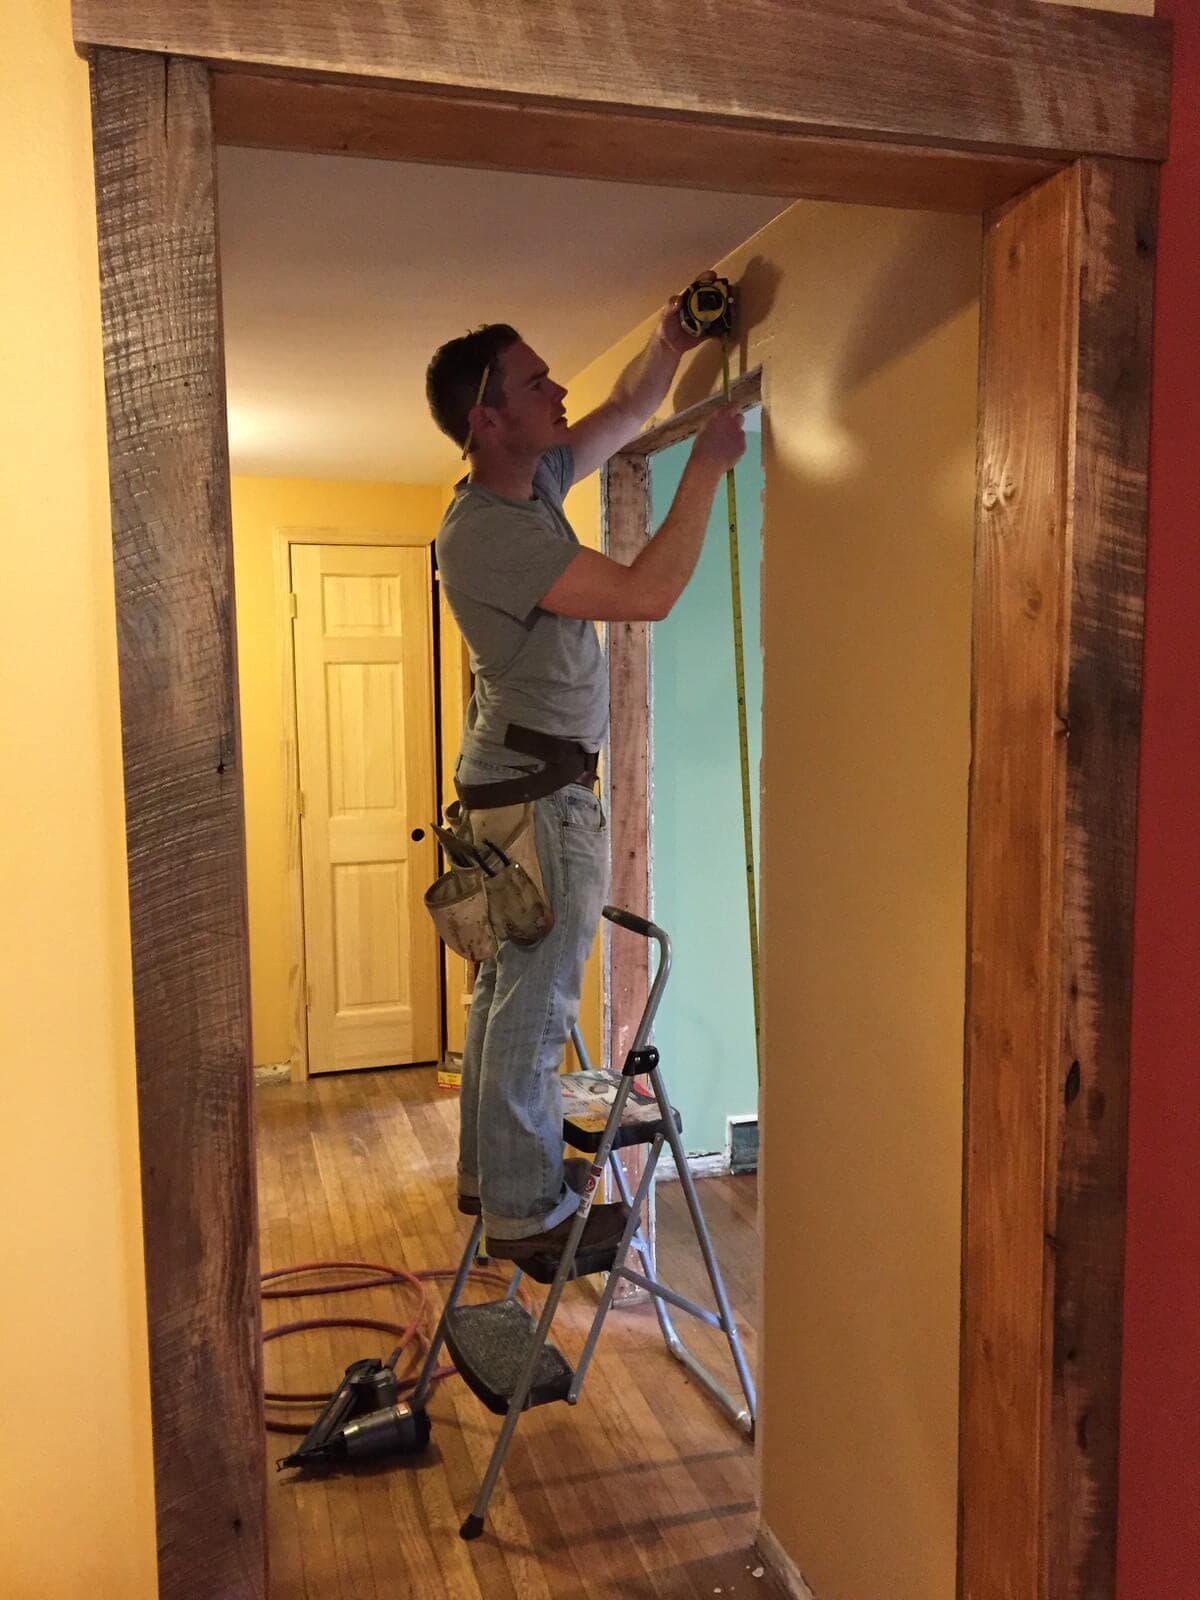 man on ladder installing Reclaimed trim around a door in asheville, nc cottage